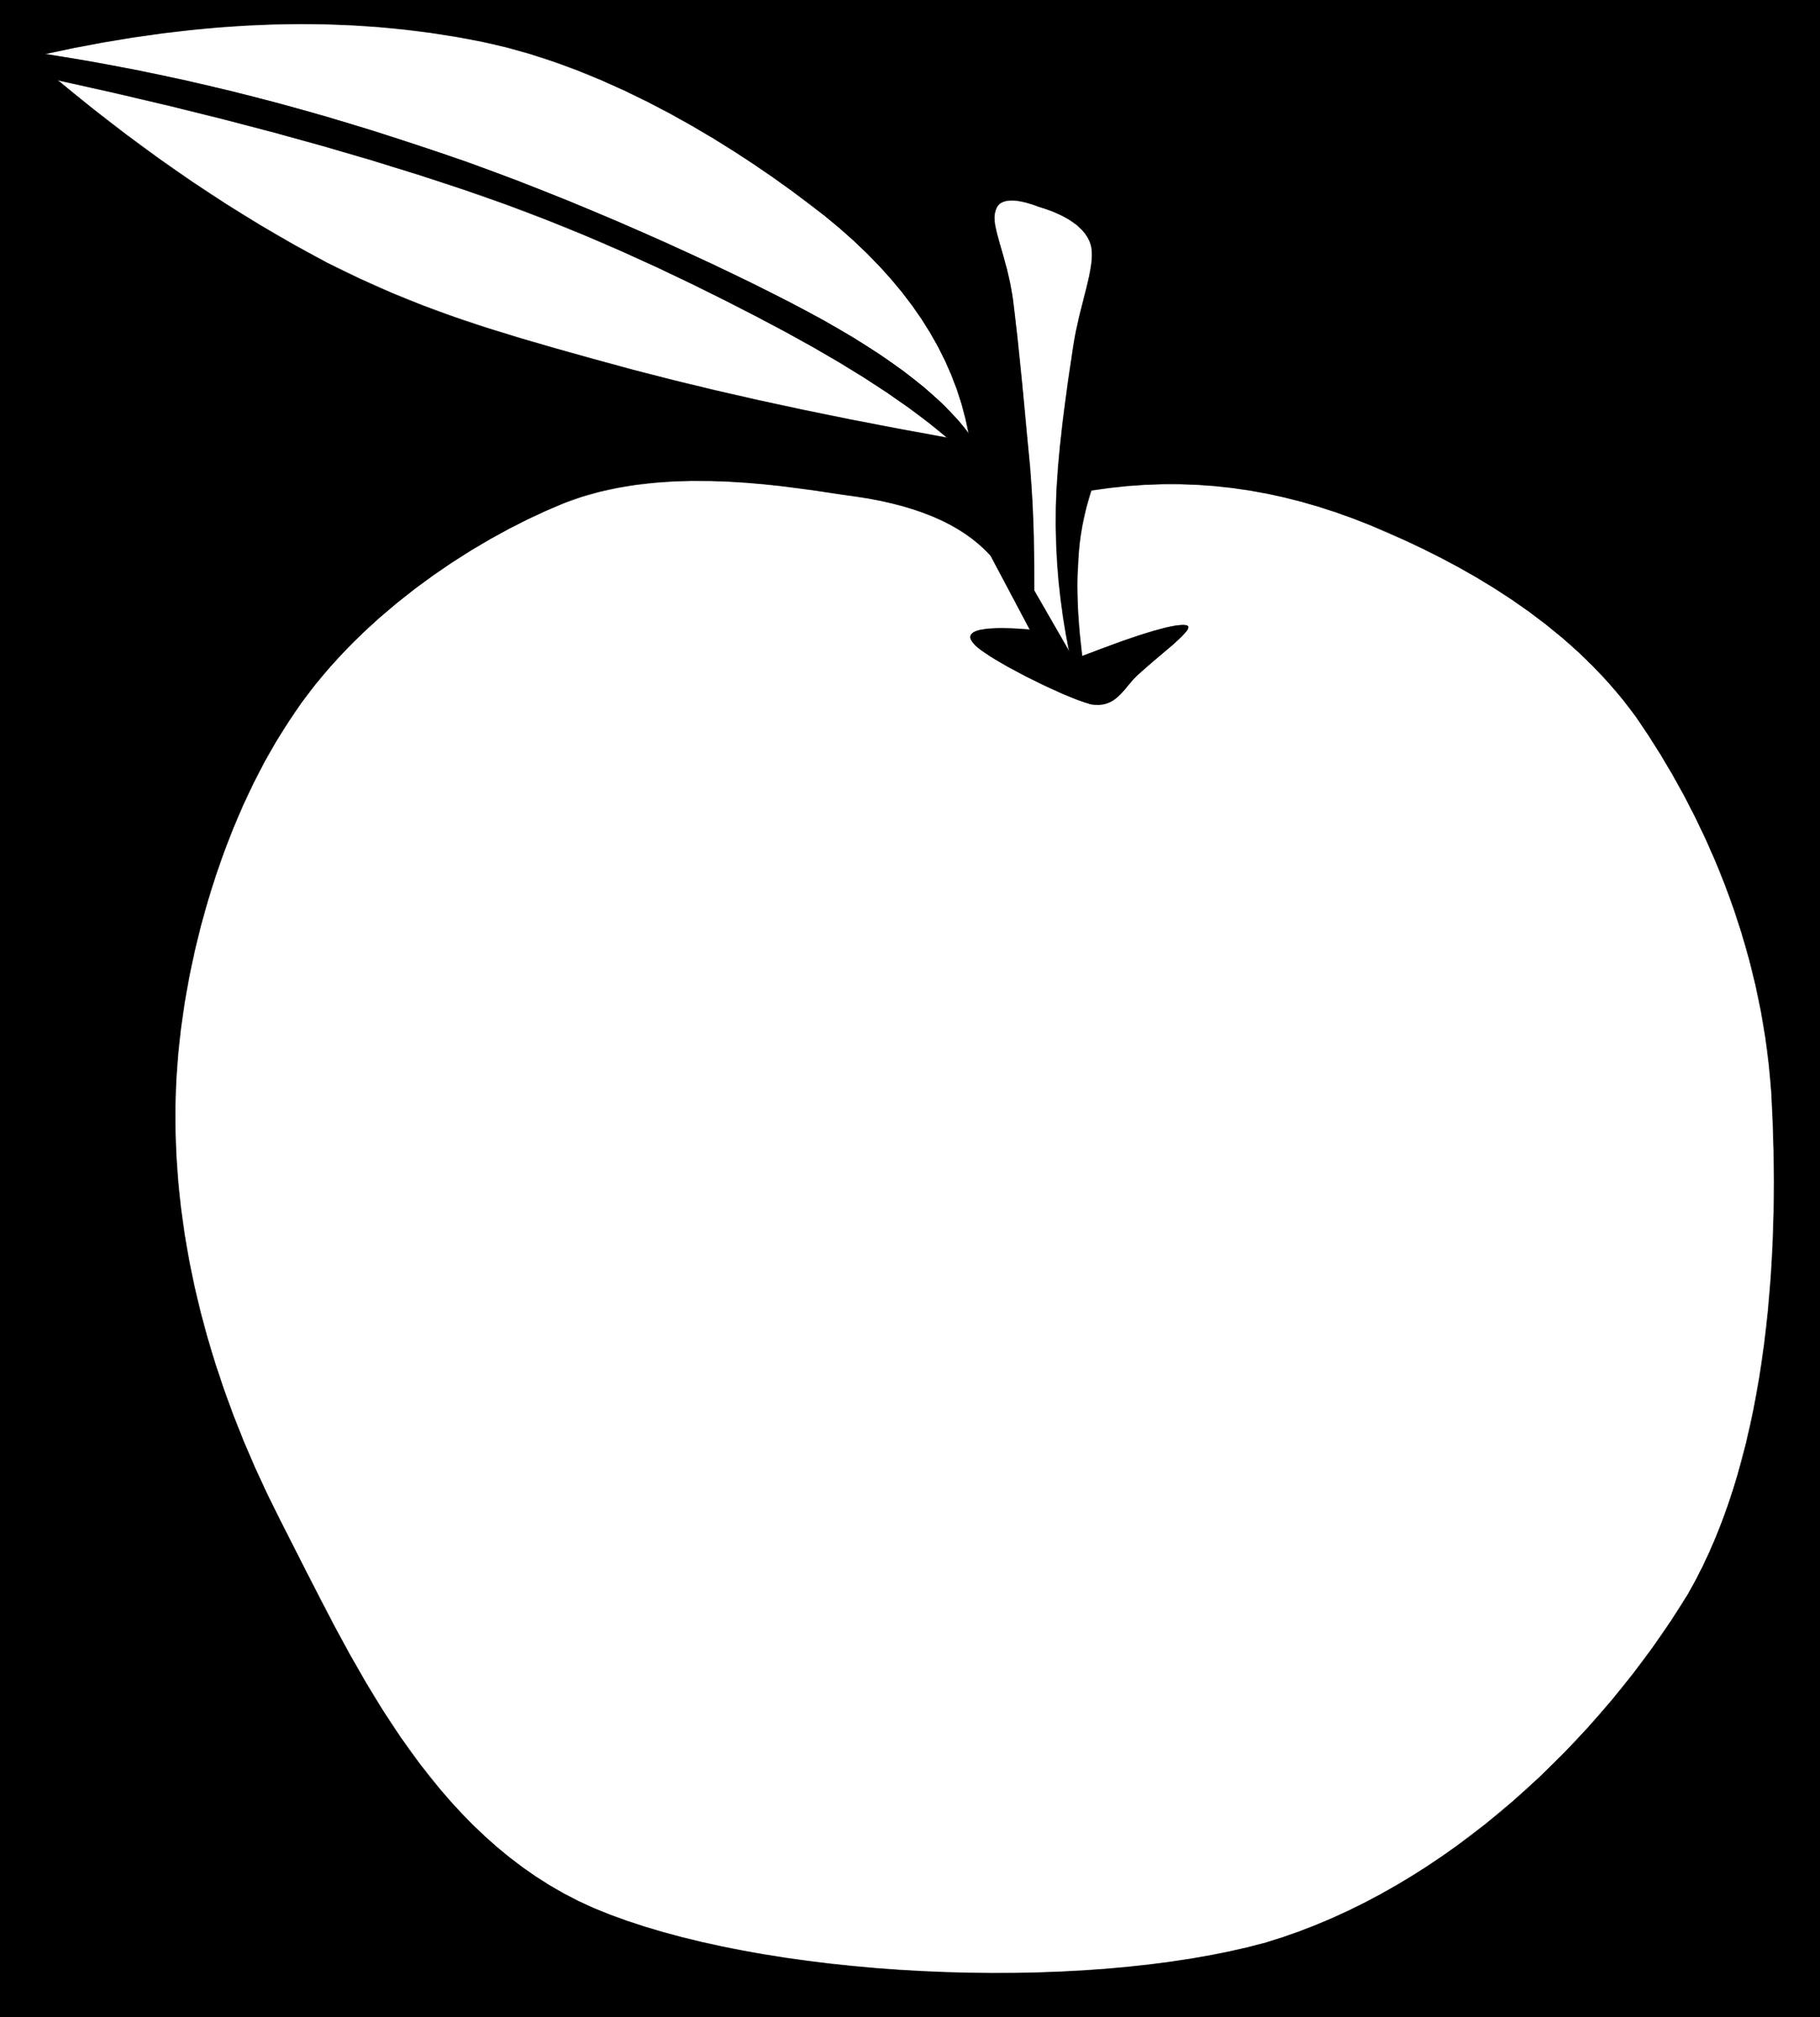 clip transparent download Apples transparent drawing. Cross contour fruit at